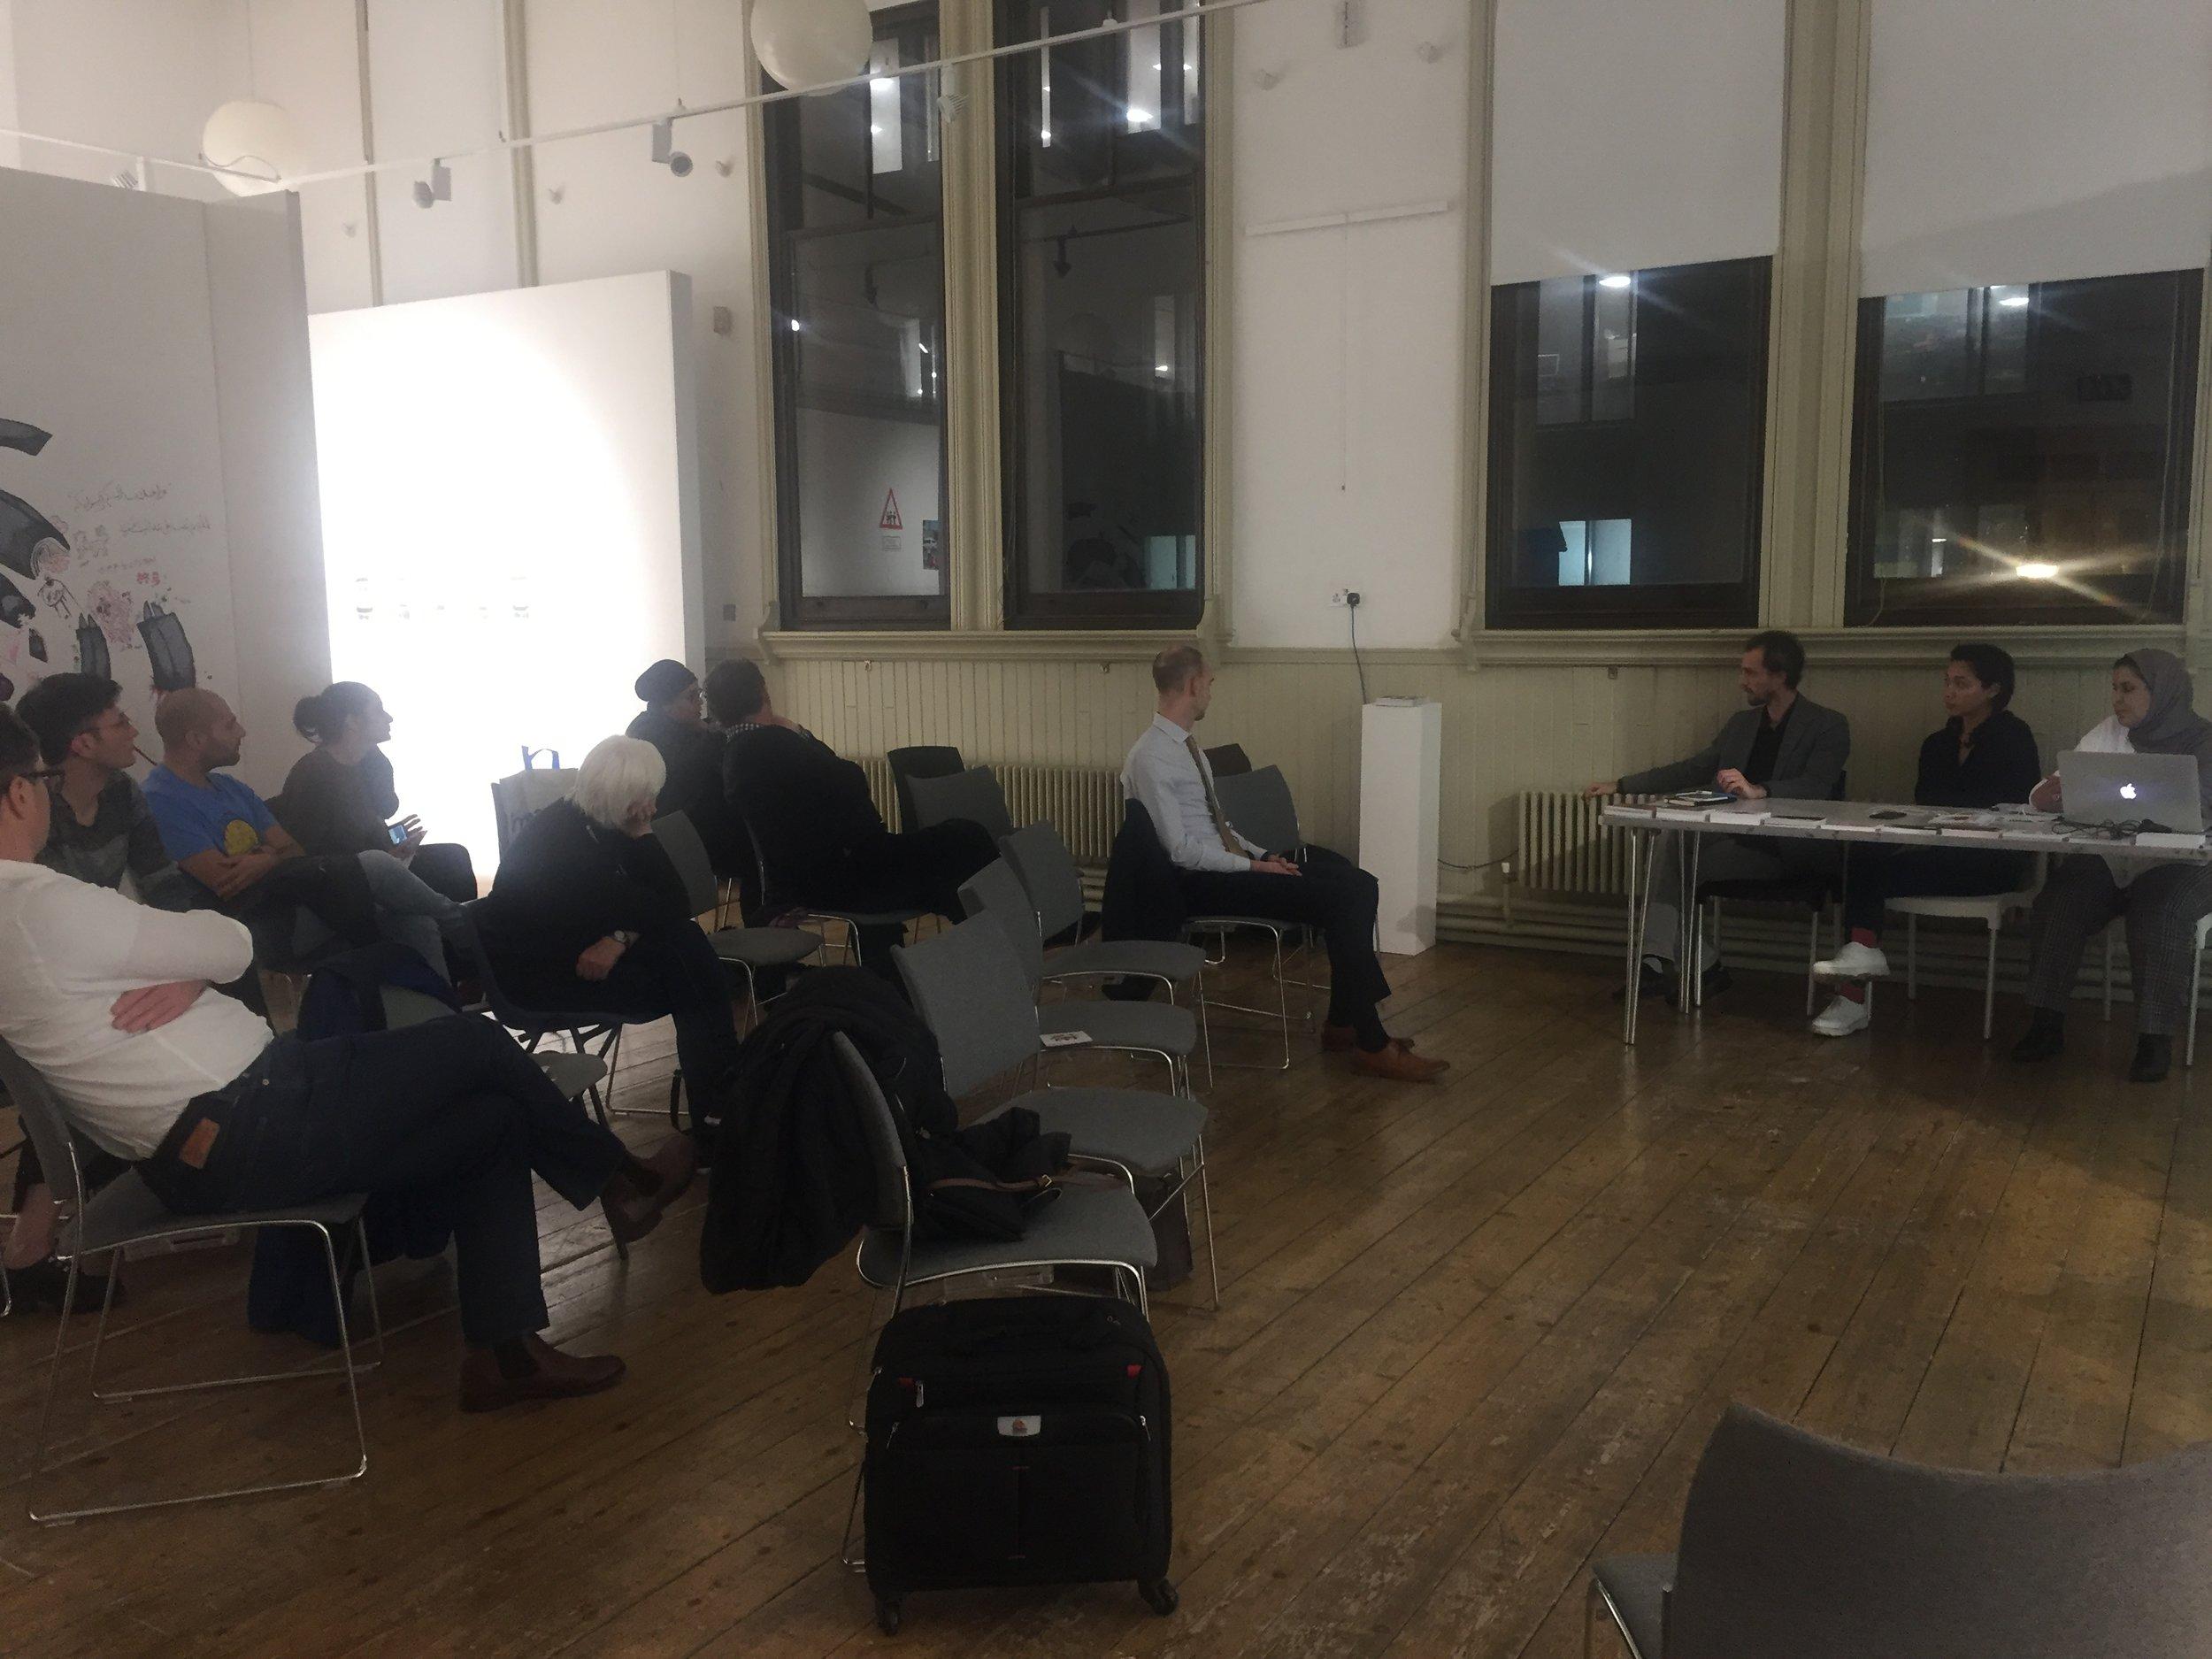 Panel Discussion with Amal Khalaf (UK),Quentin de Pimodan (France) and Khulod Albugami (Saudi Arabia)